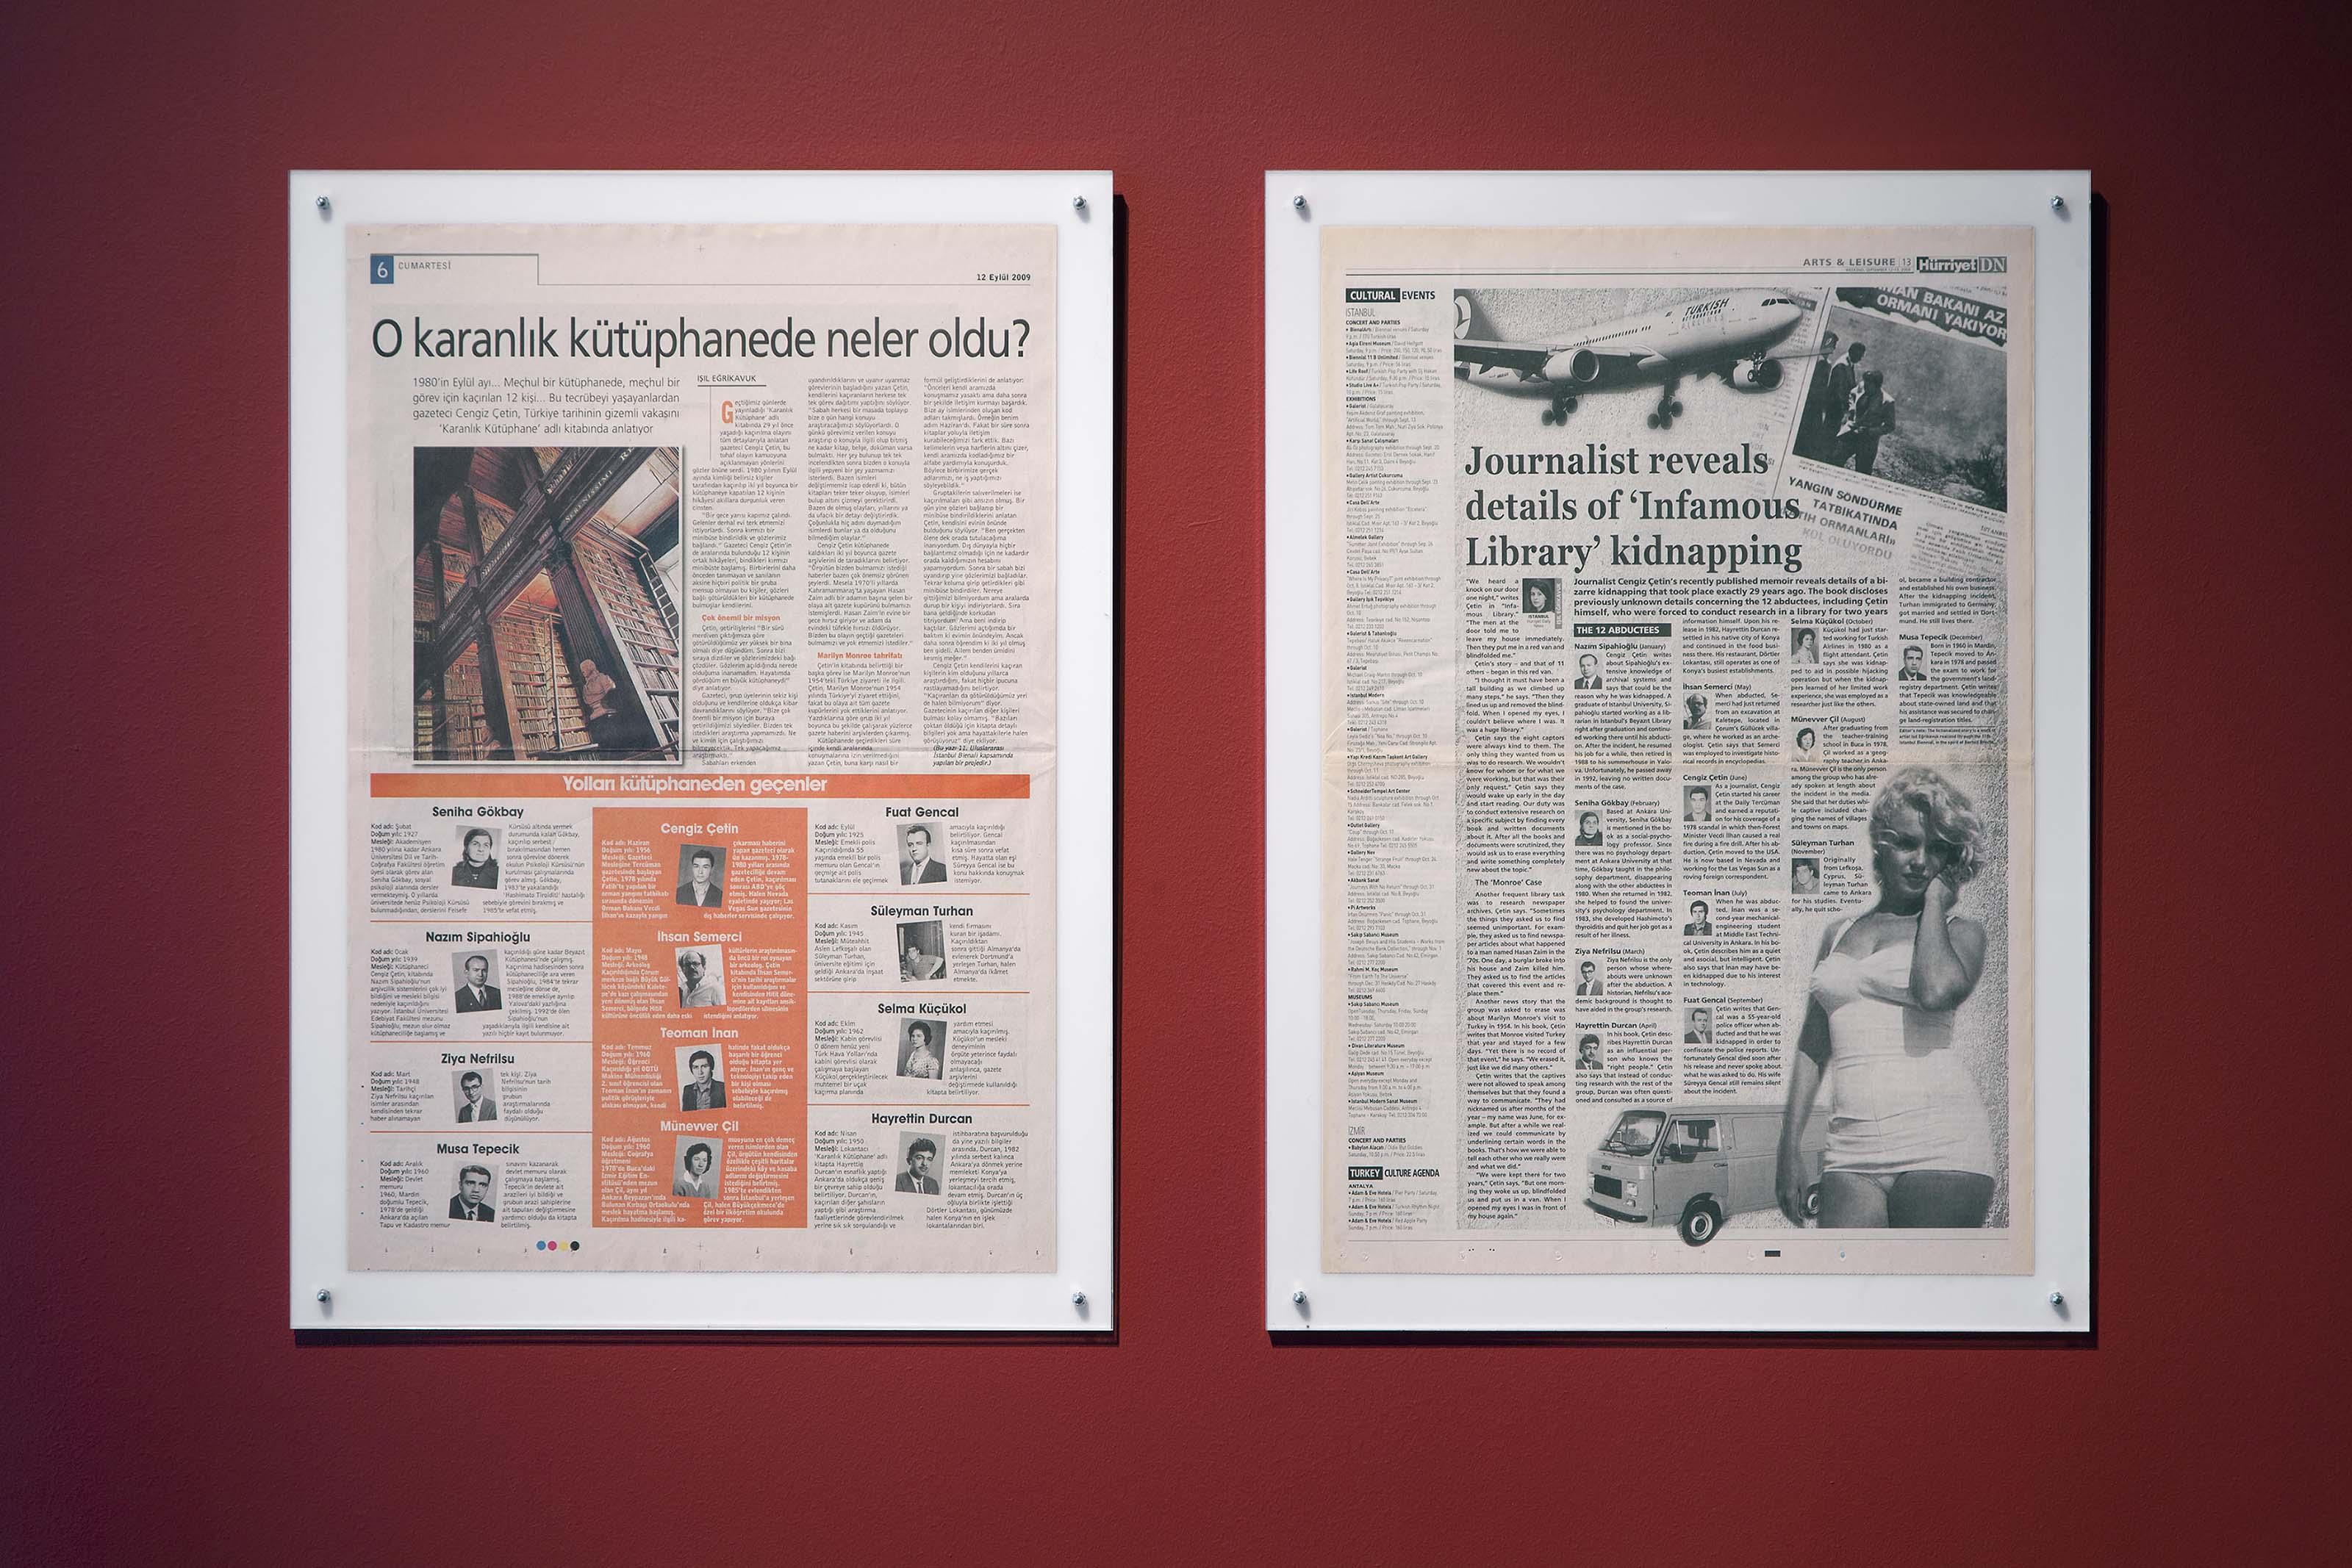 Işıl Eğrikavuk, Infamous Library, 2009, Newspaper project, diptych (Radikal – Hürriyet Daily News, 12.09.2009) 1+ 1 AP Ebat: 45 X 65 cm.